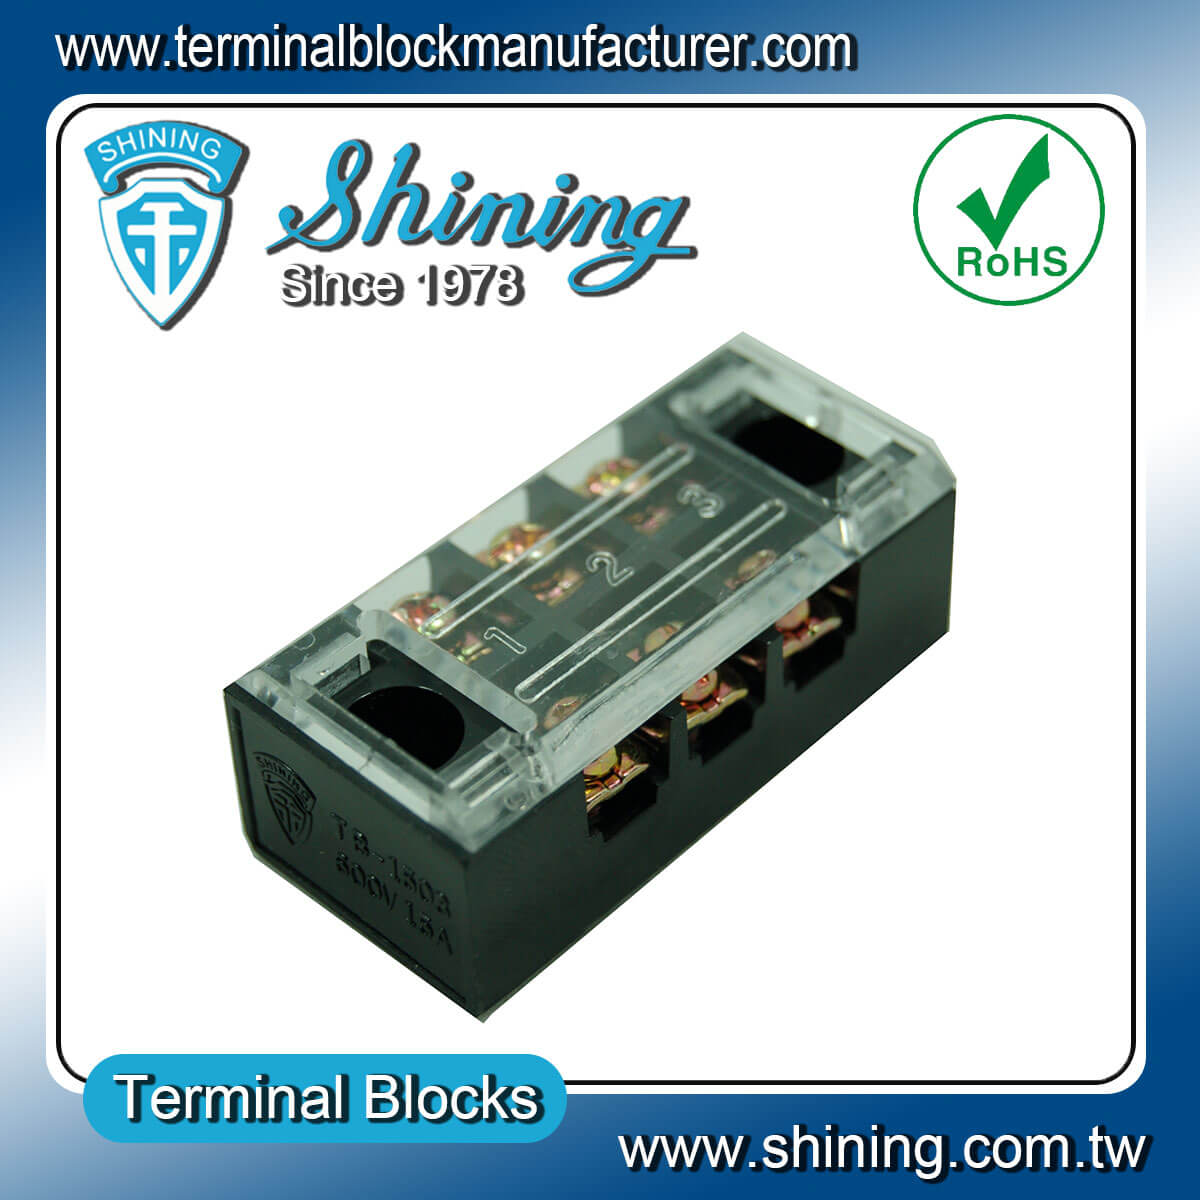 TB-1503 600V 15A 3Pole固定式柵欄端子台